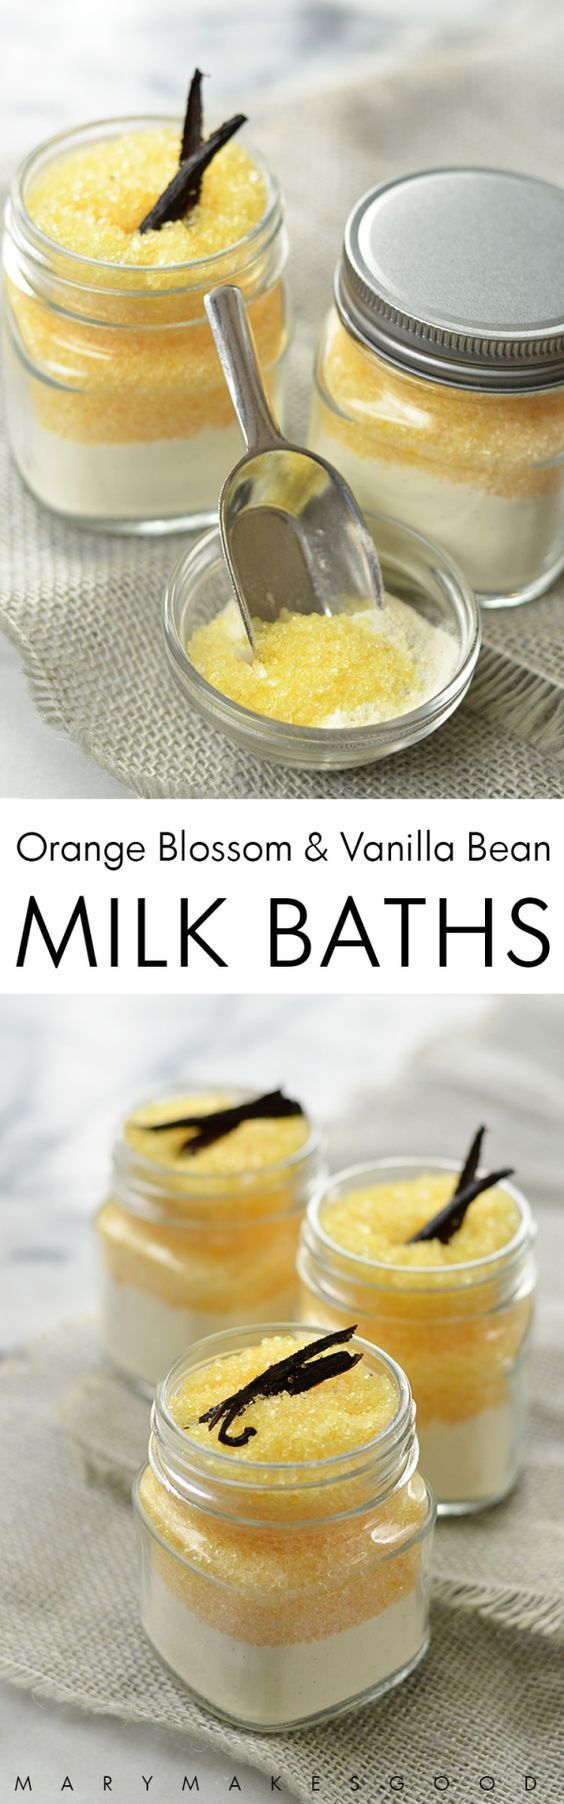 Orange Blossom & Vanilla Bean Milk Baths